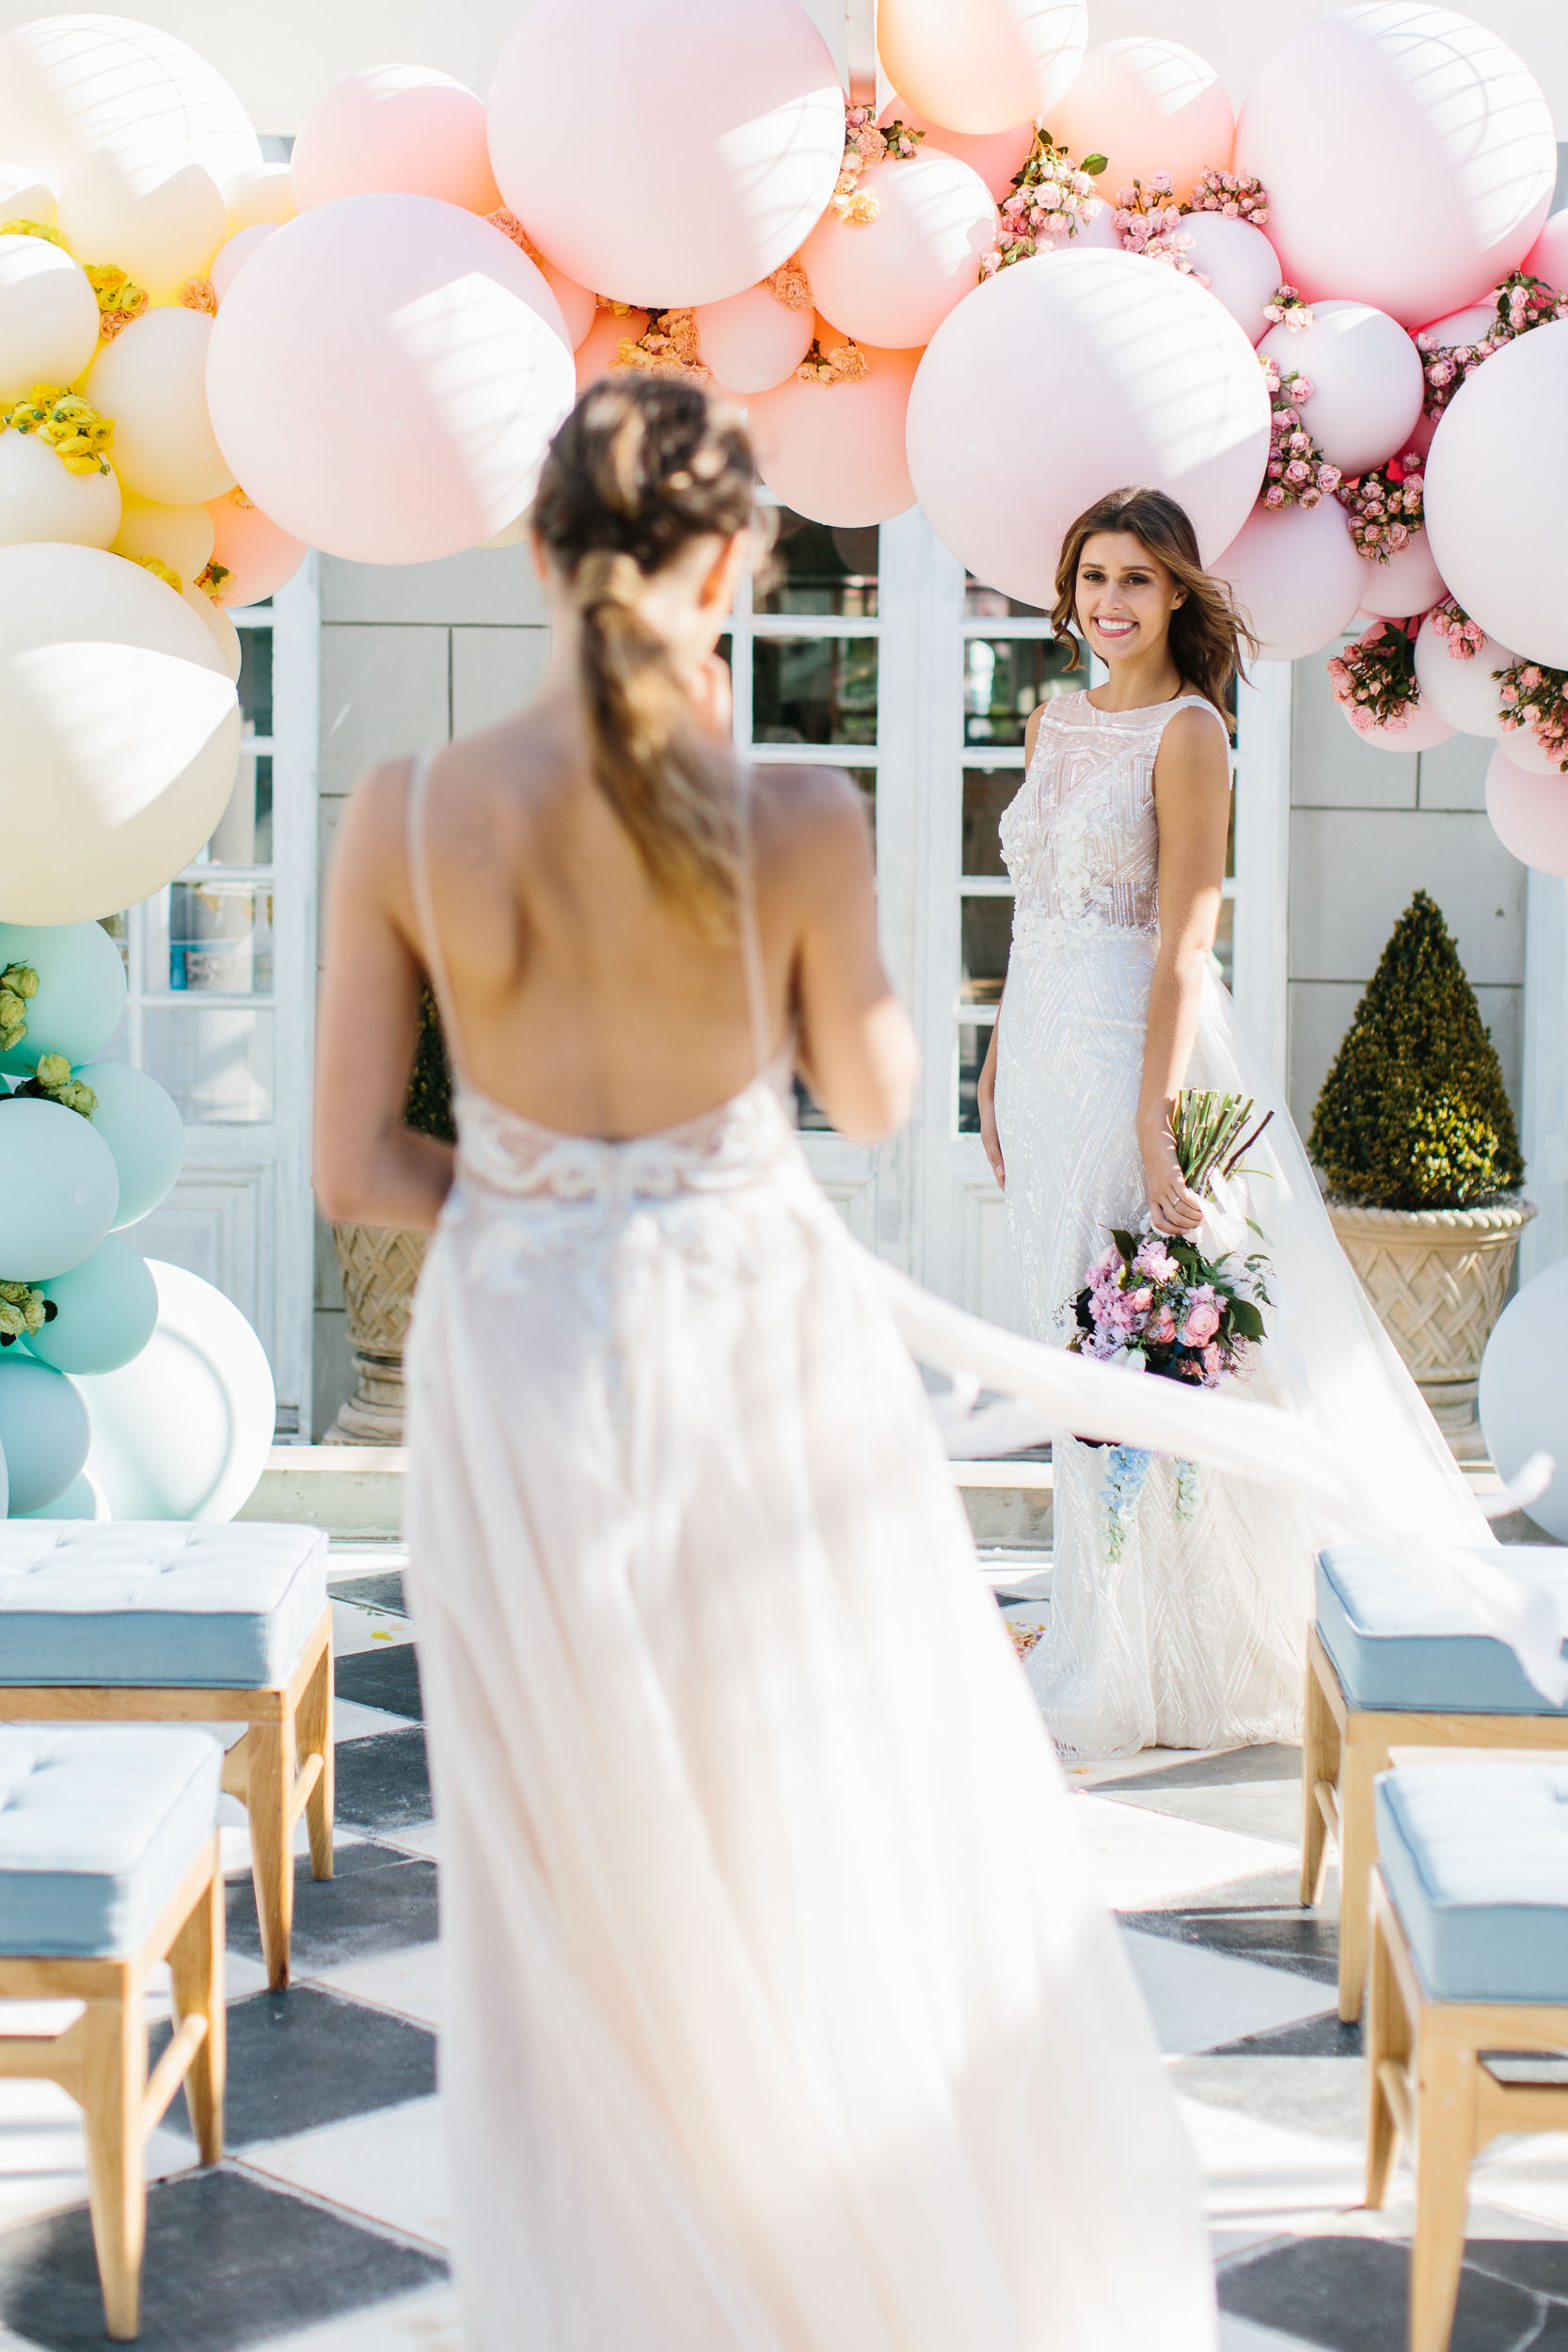 Same Sex Wedding Ceremony | Wedding Photography by Kas Richards